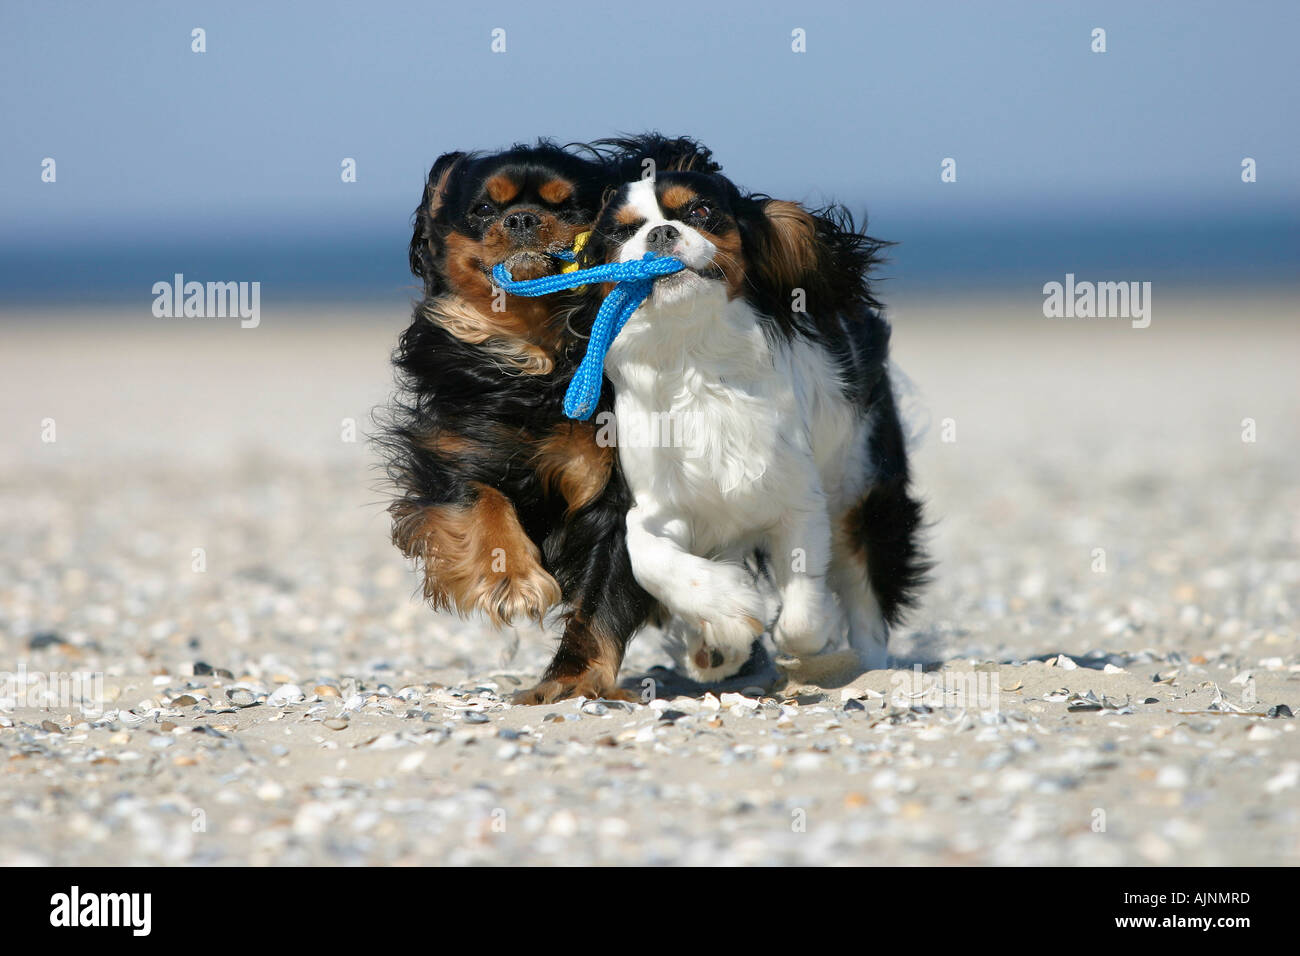 Cavalier King Charles Spaniel retrieving ball at beach Cavalier King Charles Spaniel apportieren Ball am Strand Stock Photo